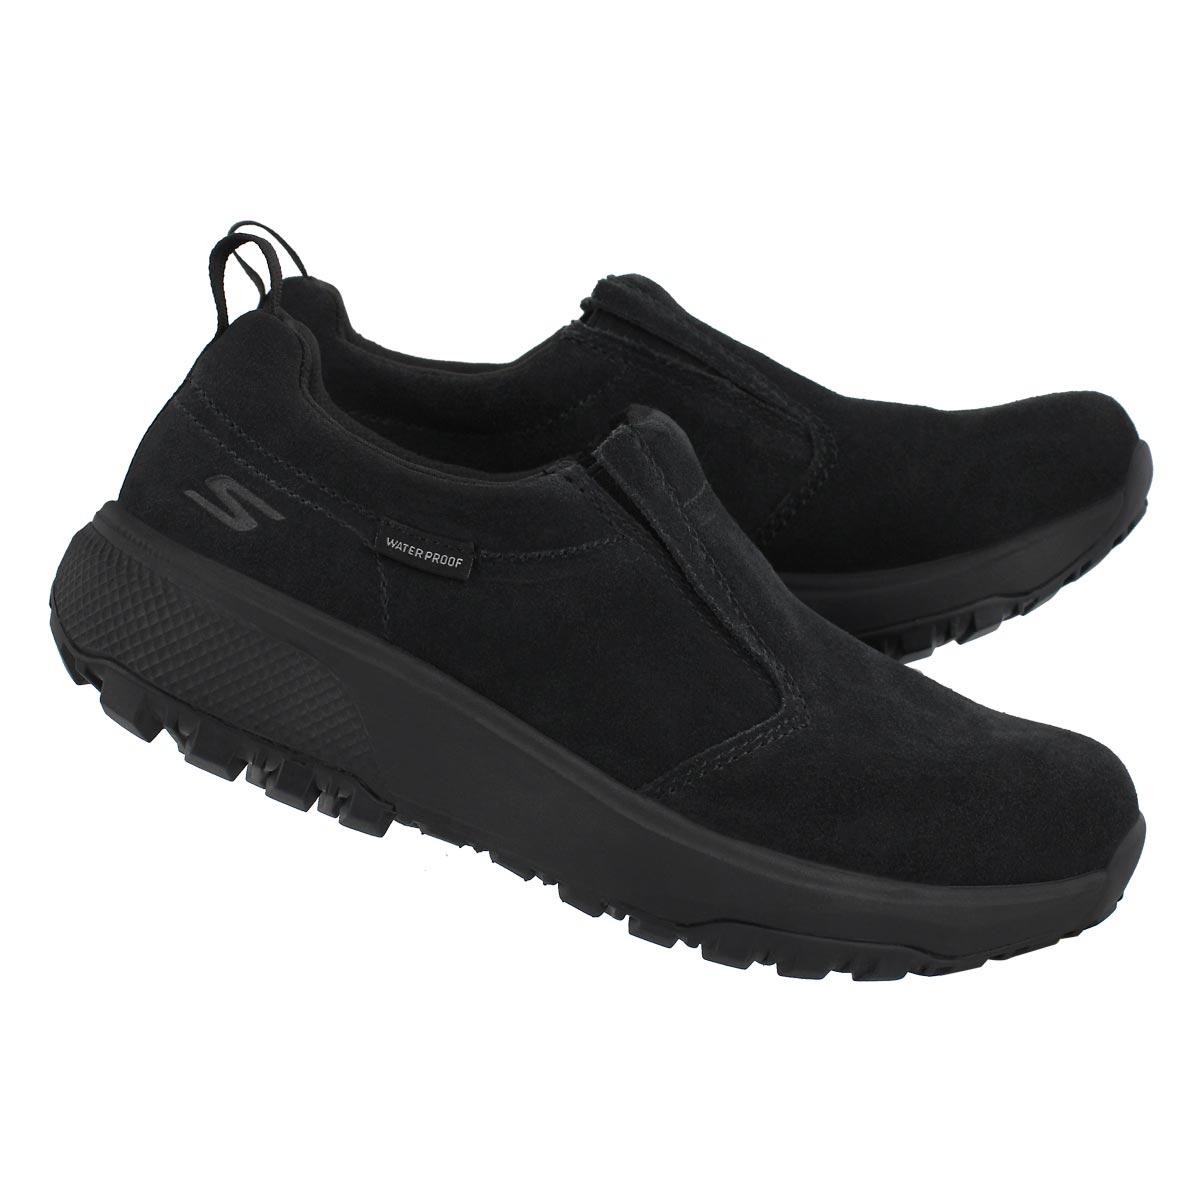 Lds Outdoor Ultra blk wtpf slip on shoe